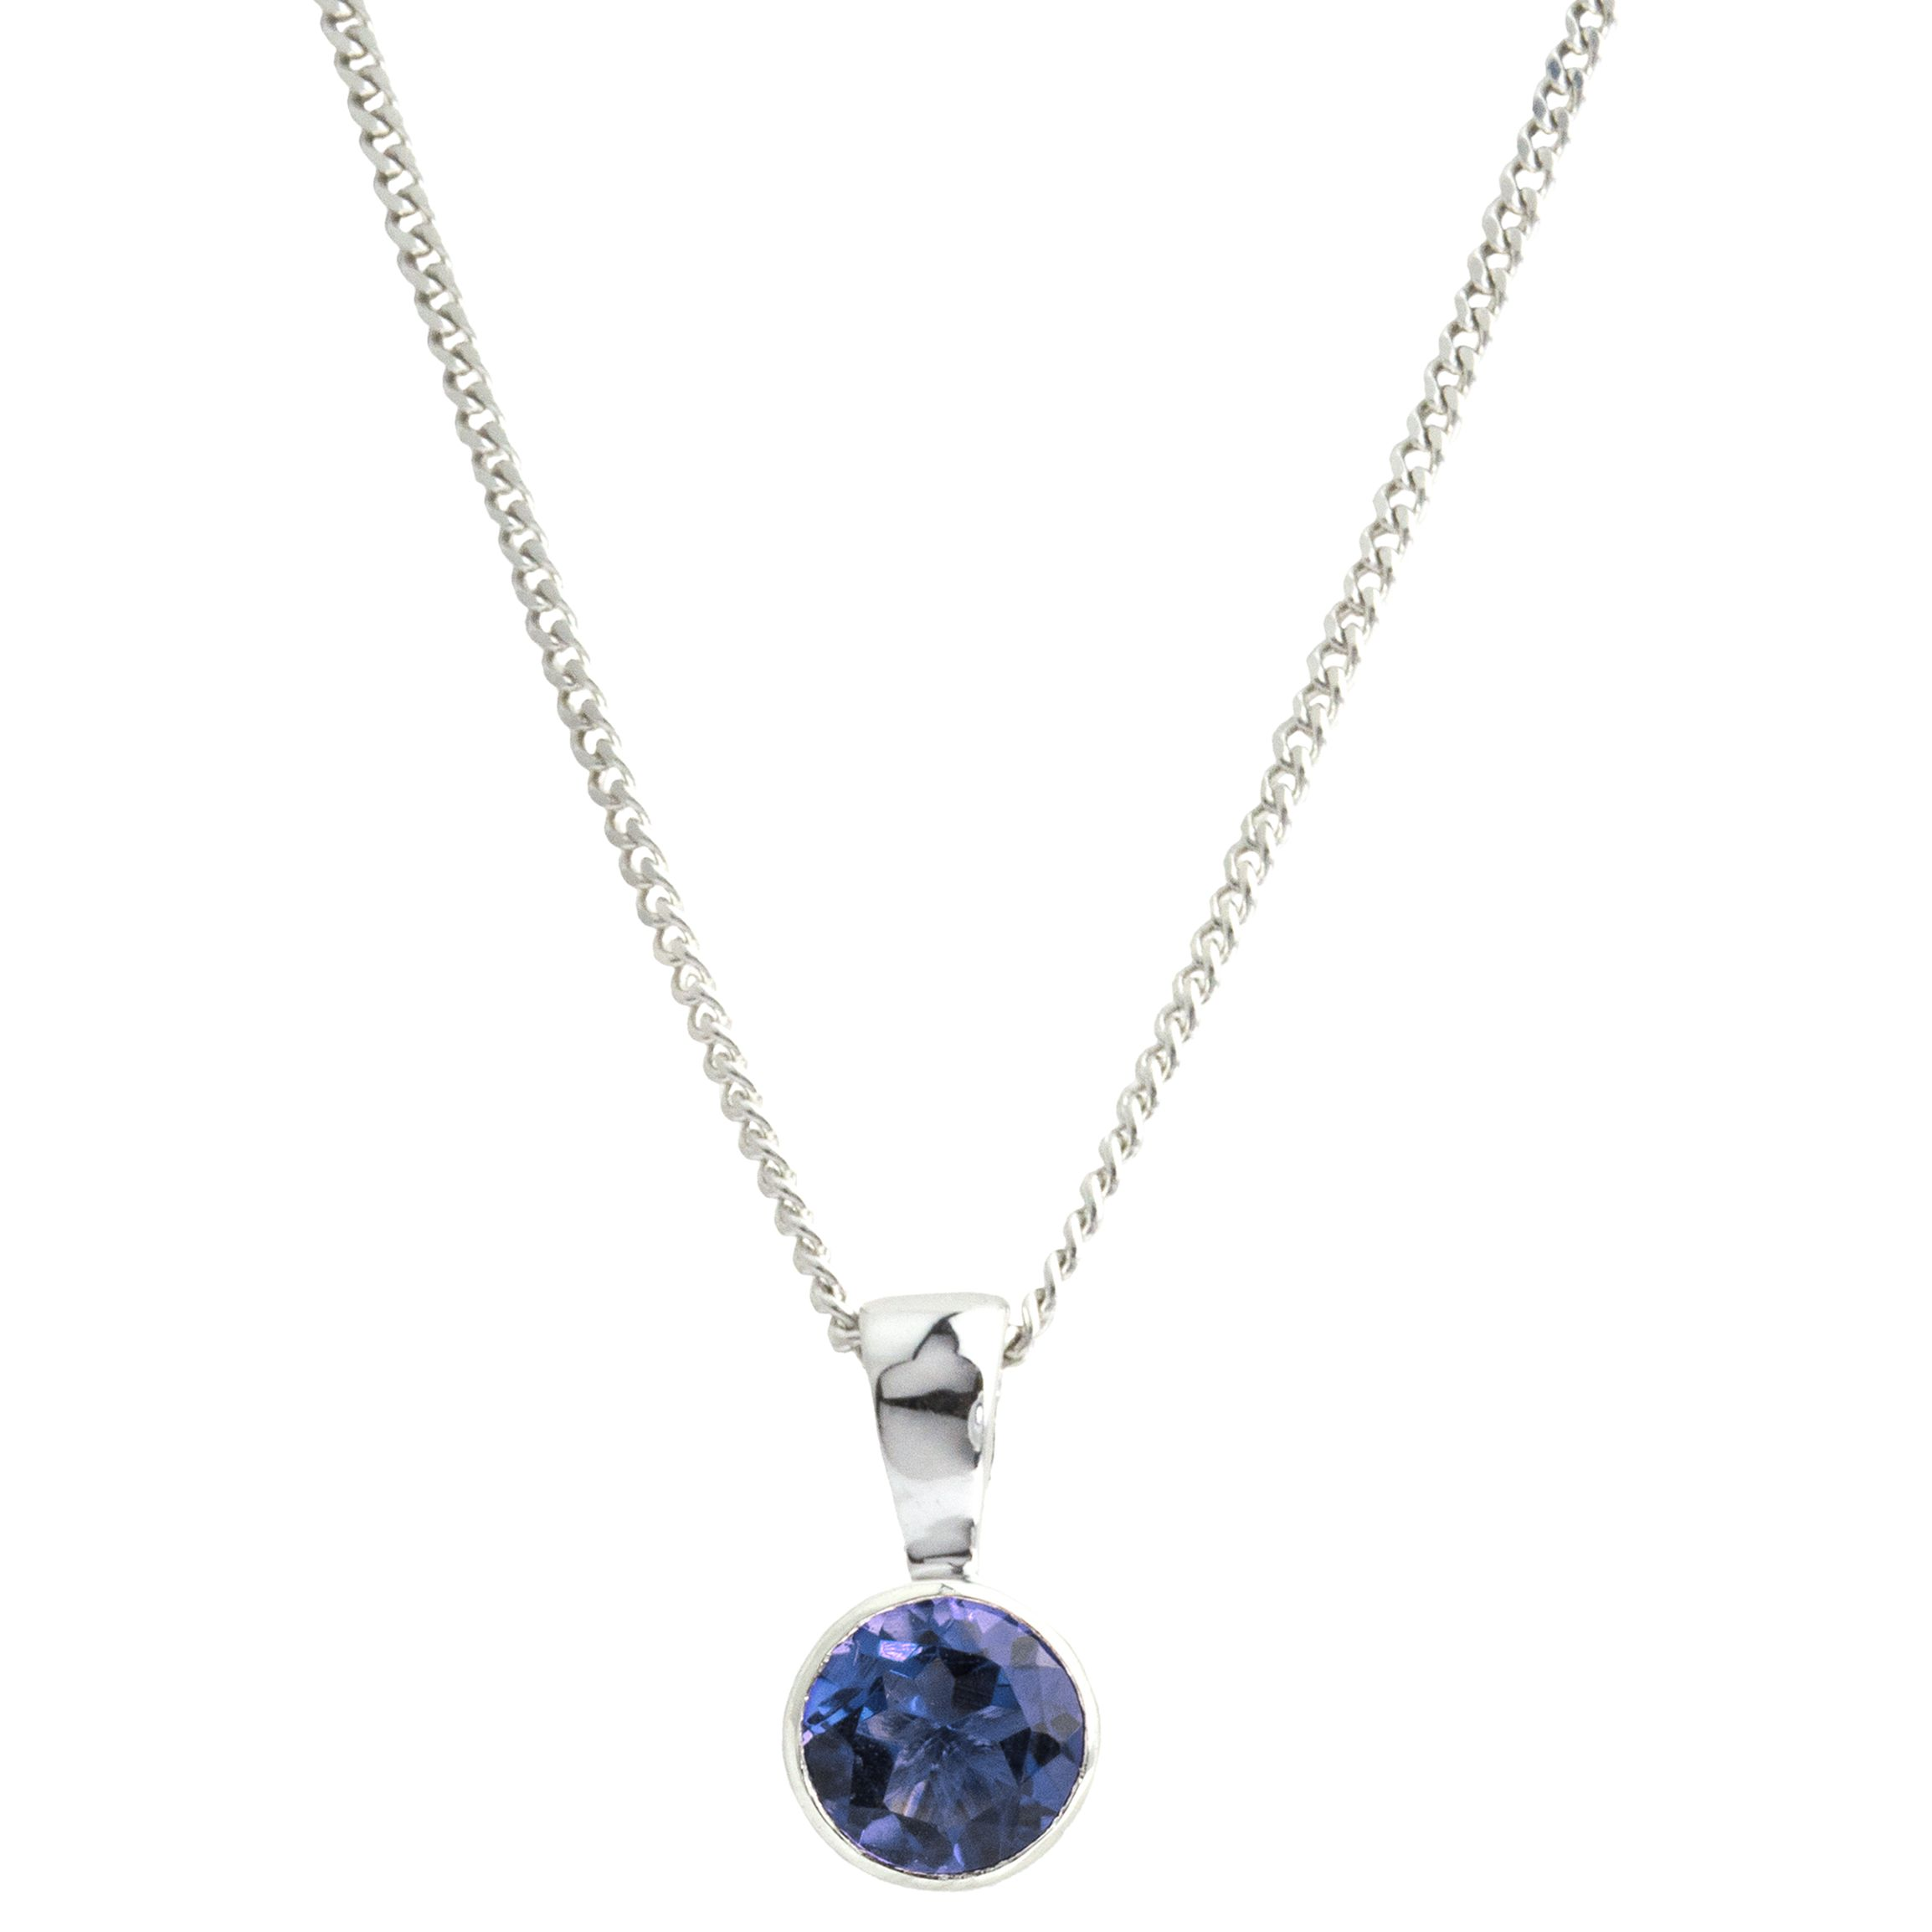 A B Davis A B Davis 9ct White Gold Round Sapphire Pendant Necklace, 0.6ct